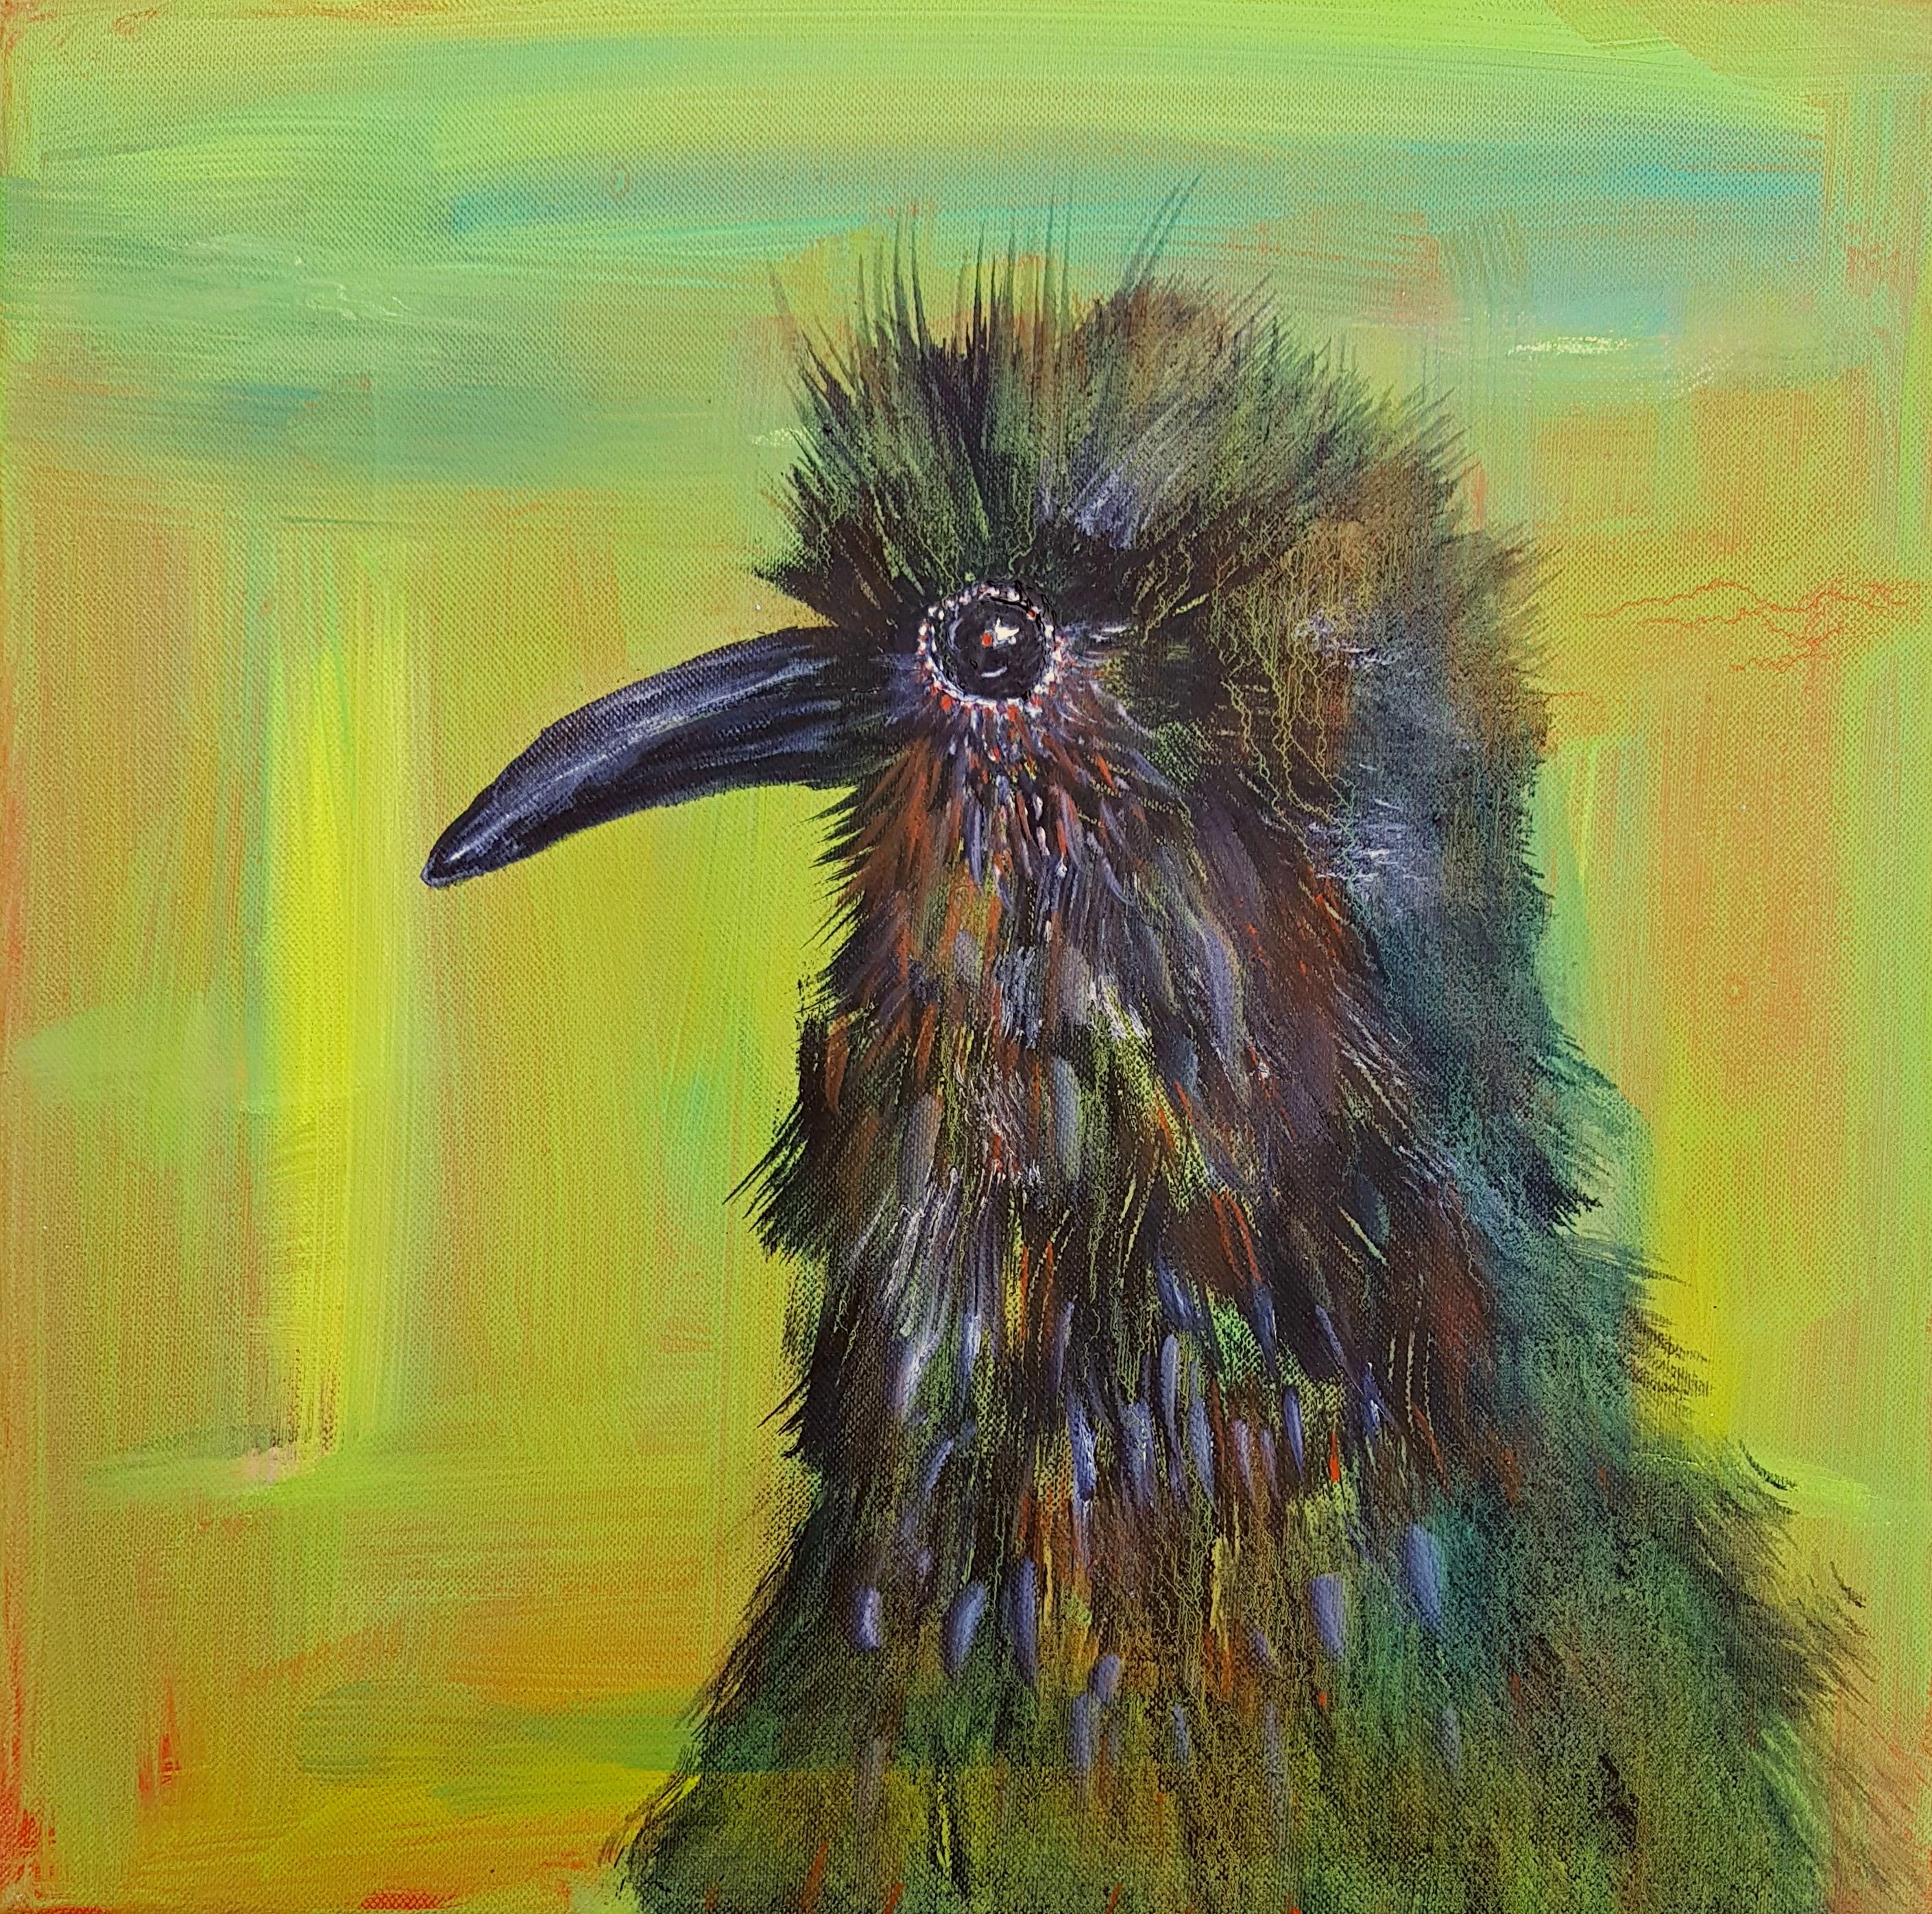 61. Mr. Beak